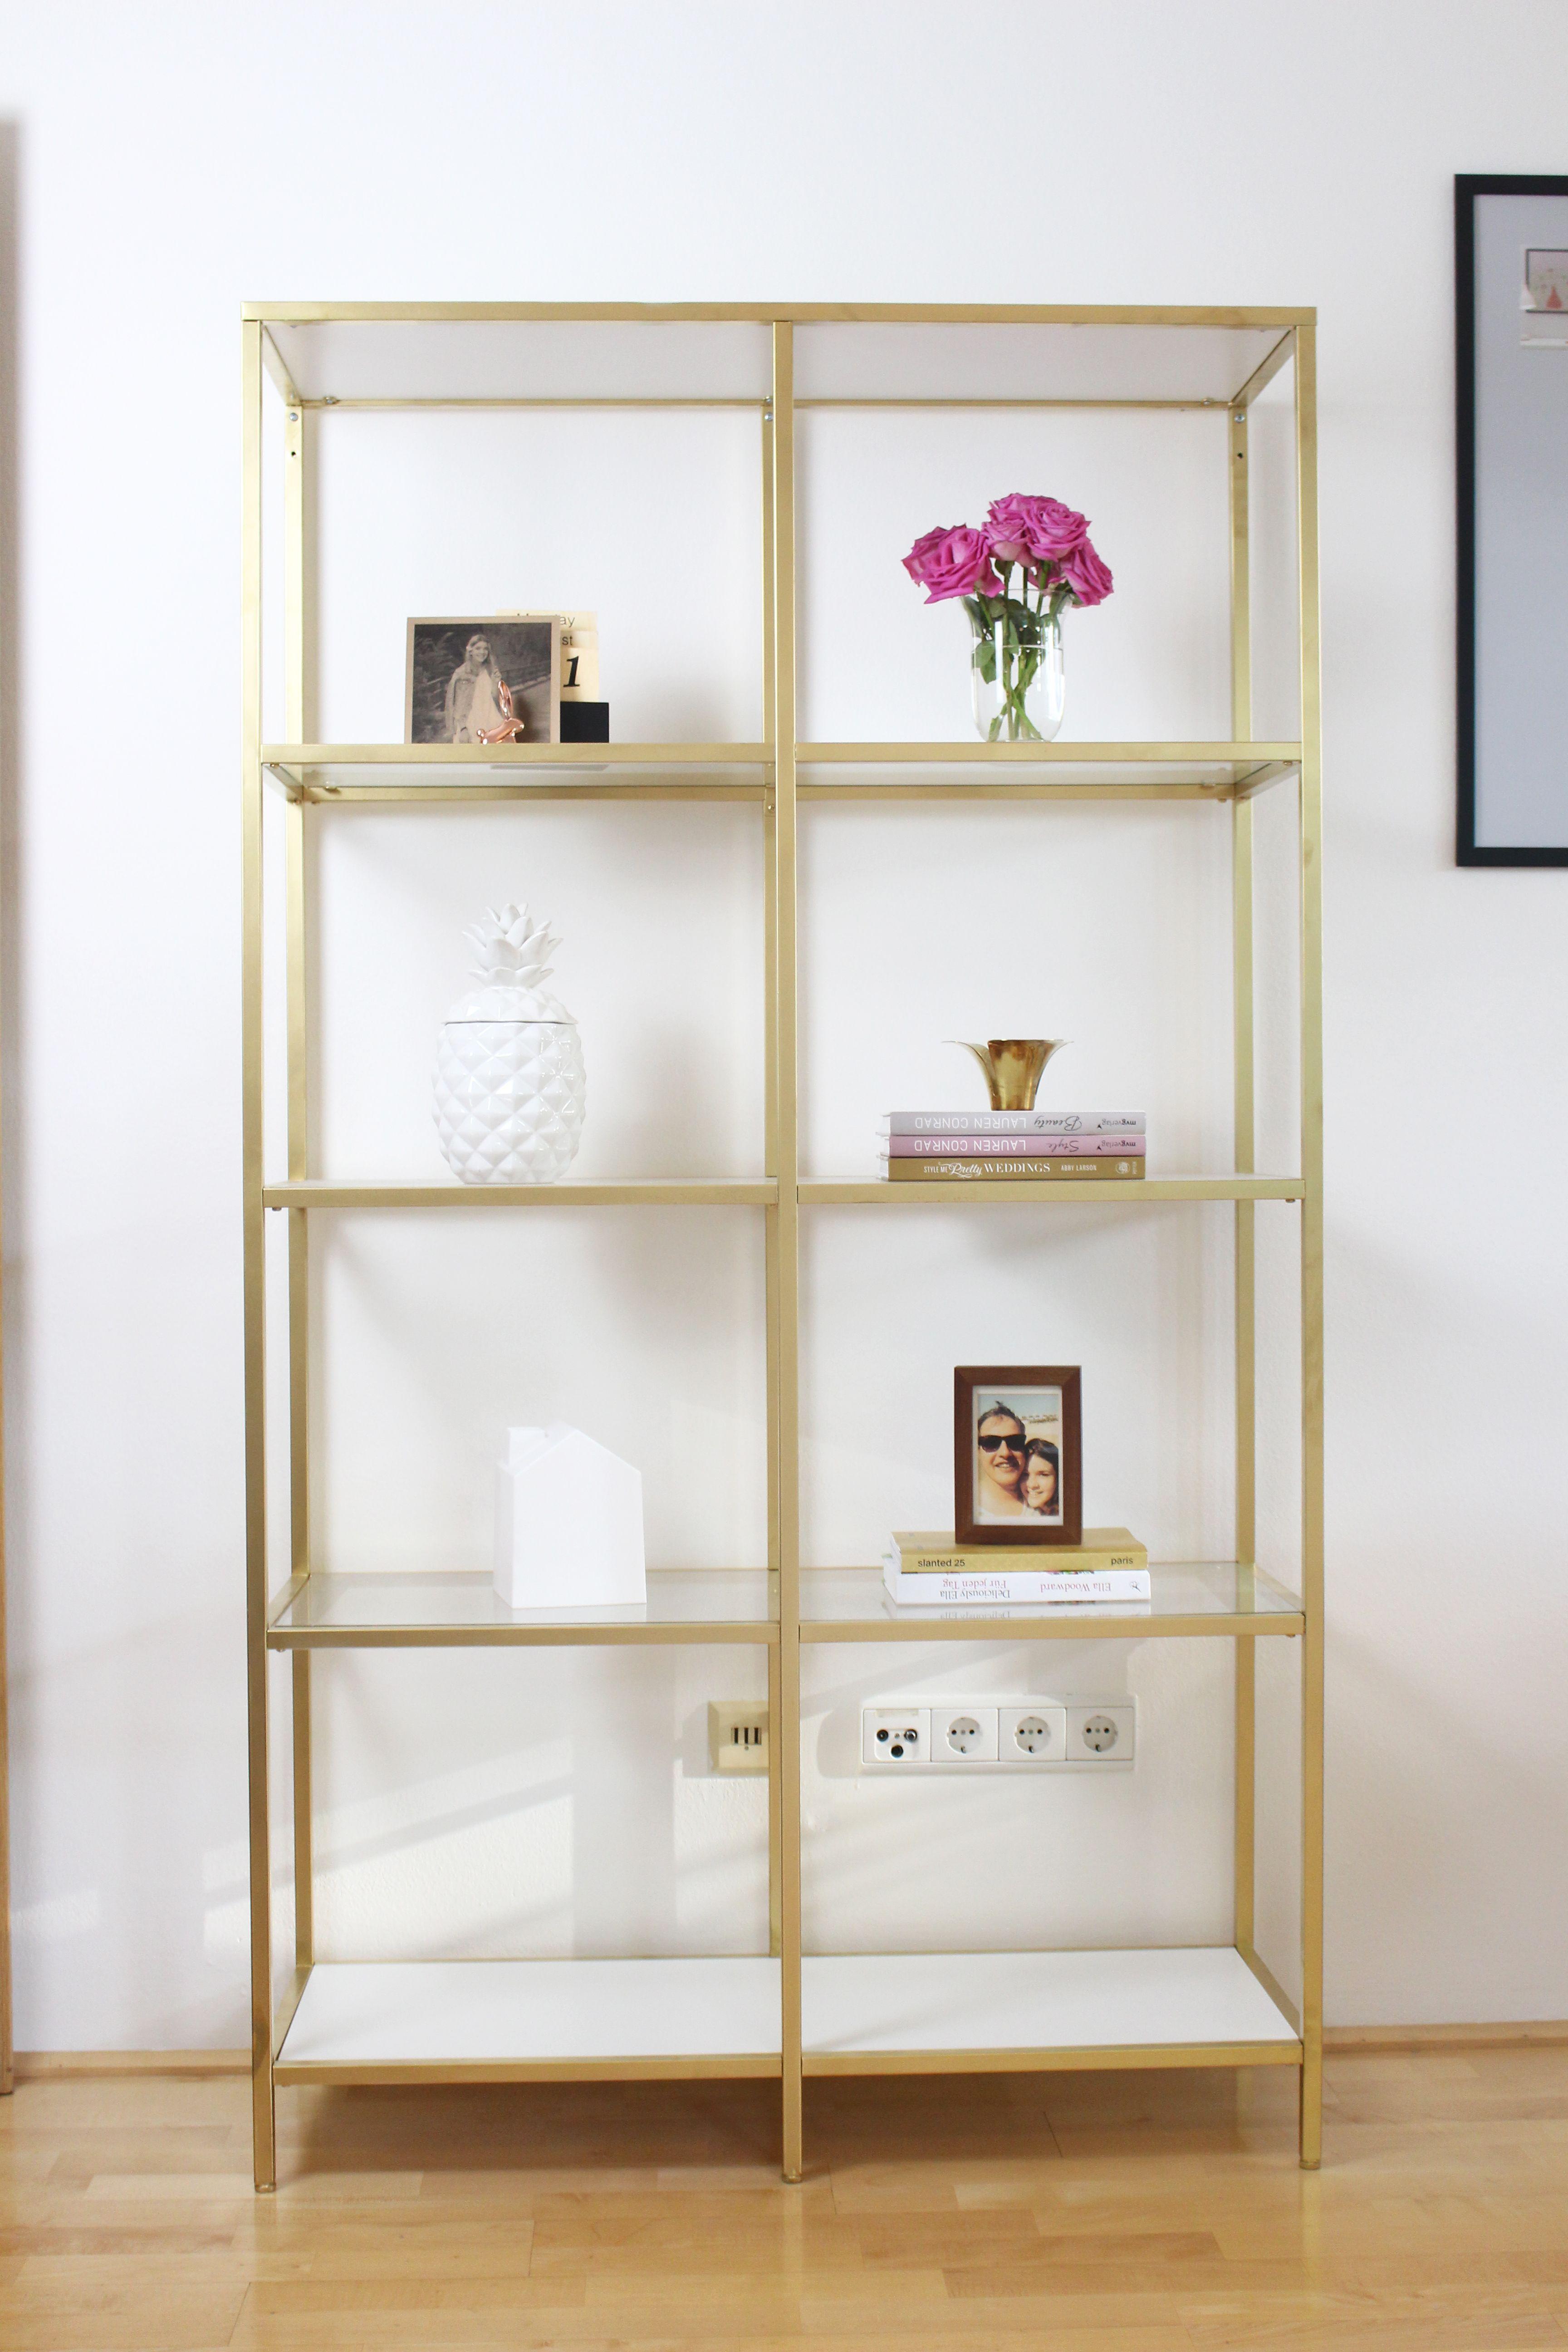 Uberlegen DIY Regal Von Ikea